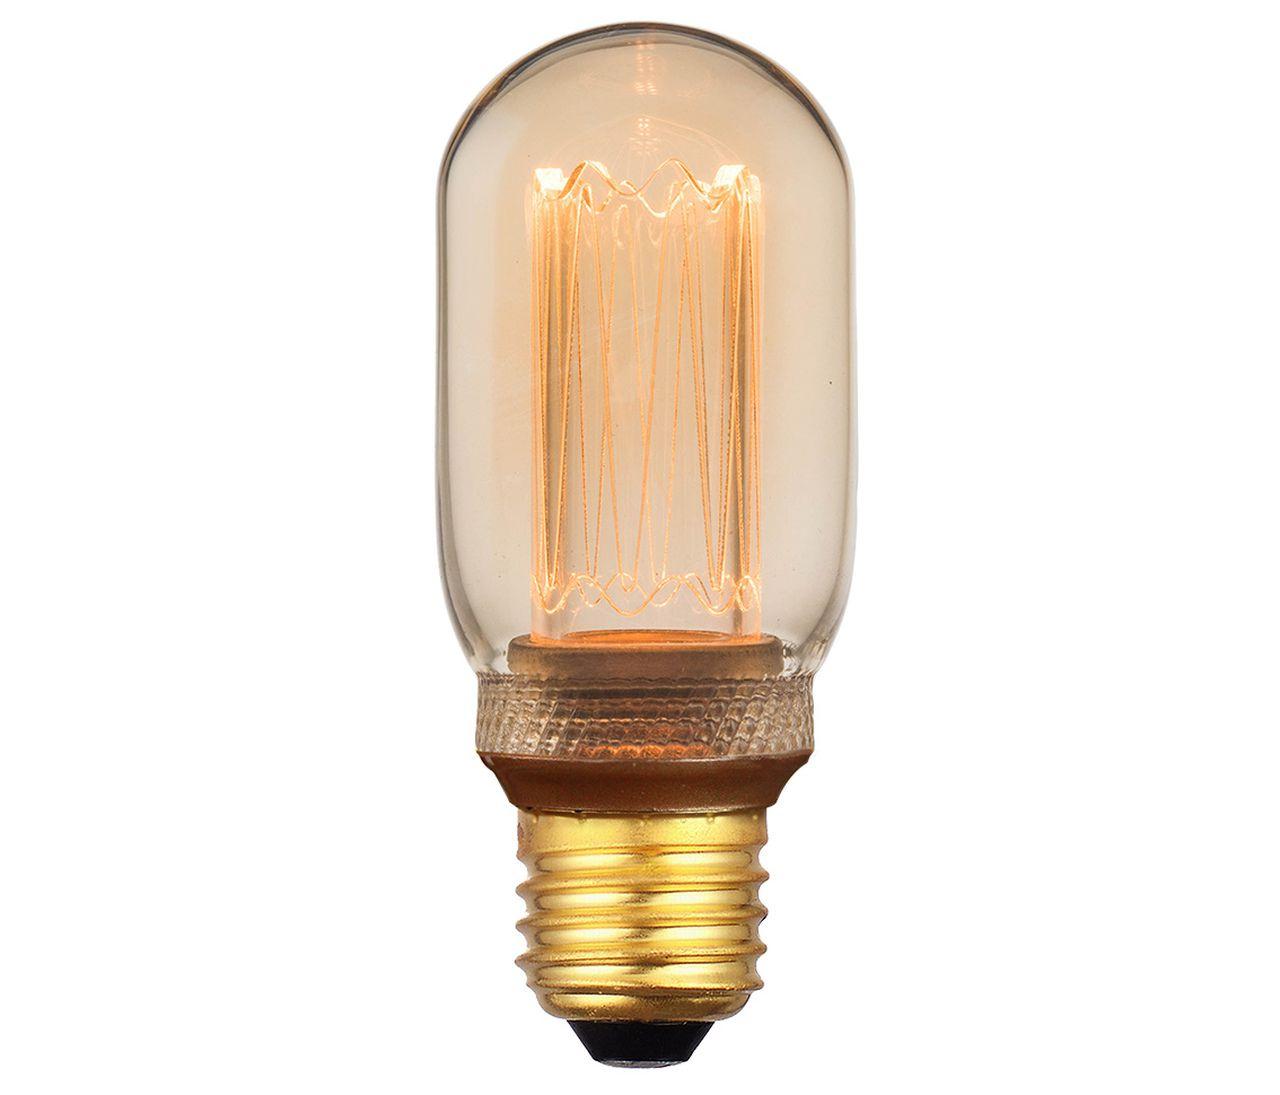 LÂMPADA DECORATIVA LED T45 2.5 W BRANCO QUENTE BIVOLT